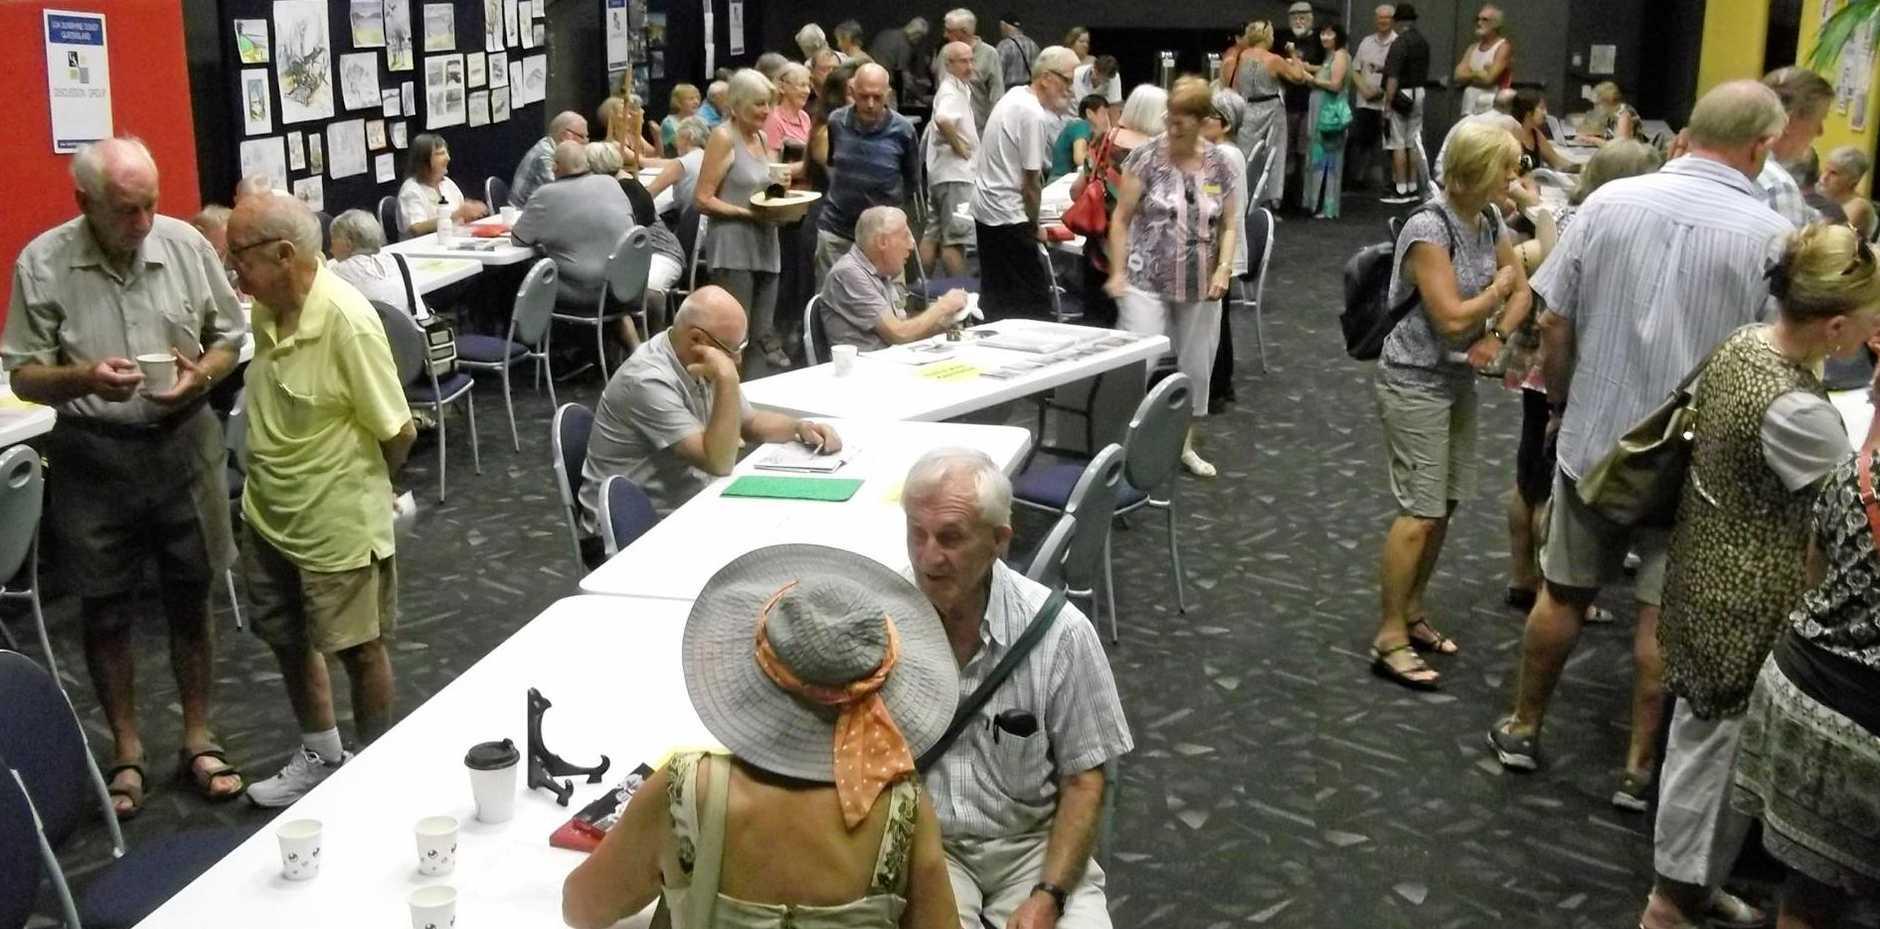 U3A Sunshine Coast tutors discuss courses at the open day.